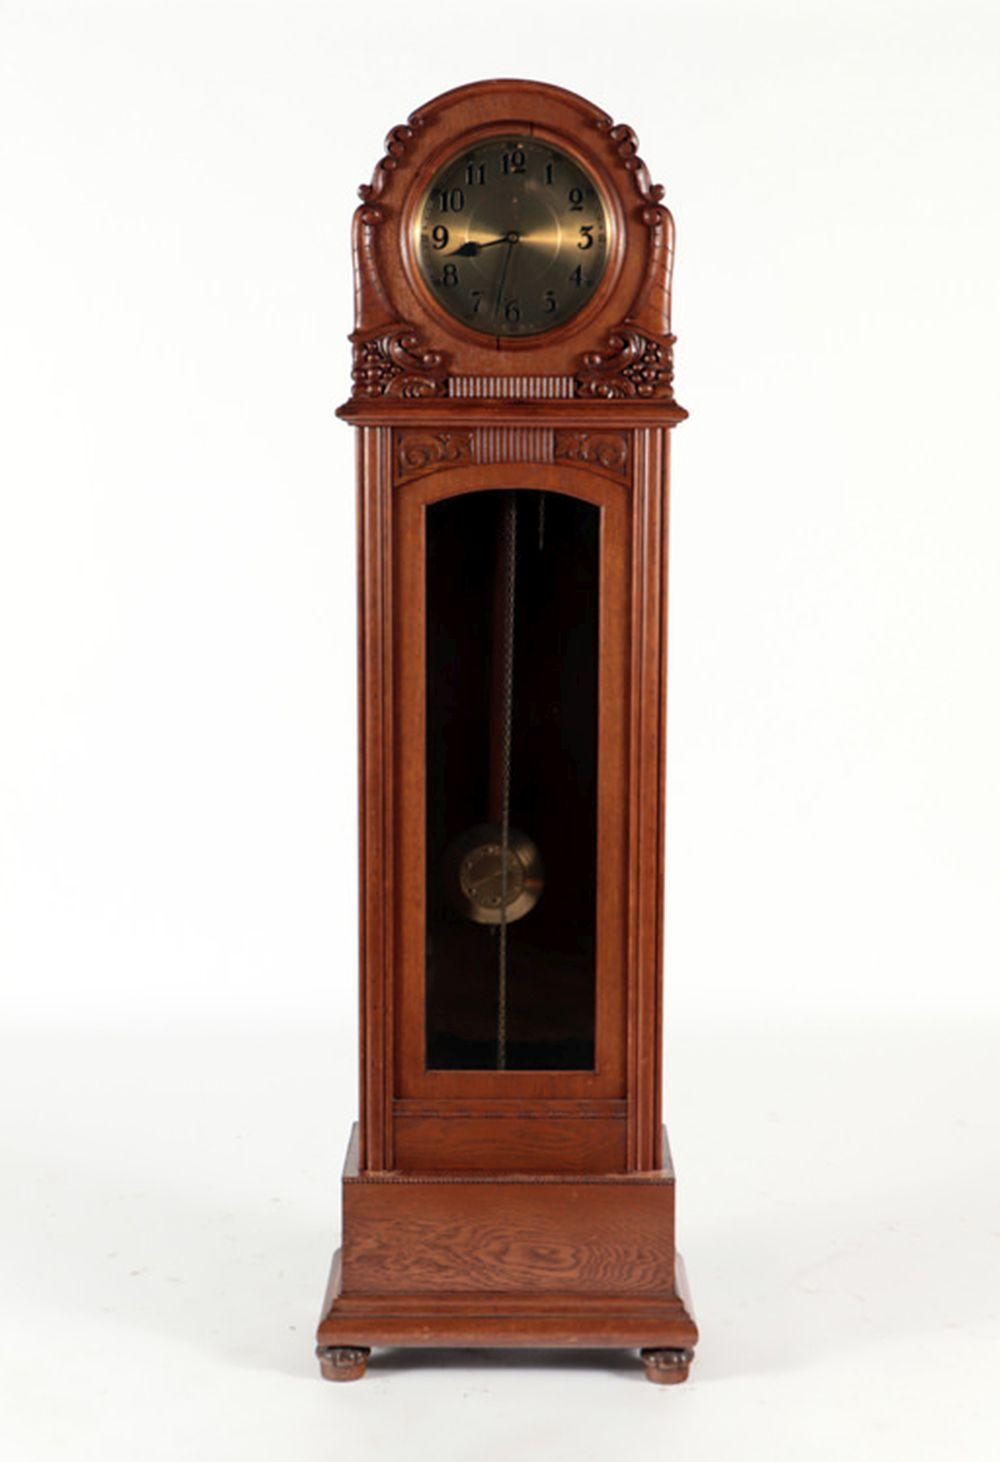 GERMAN HANS WINTERHALDER GRANDFATHER CLOCK C.1920